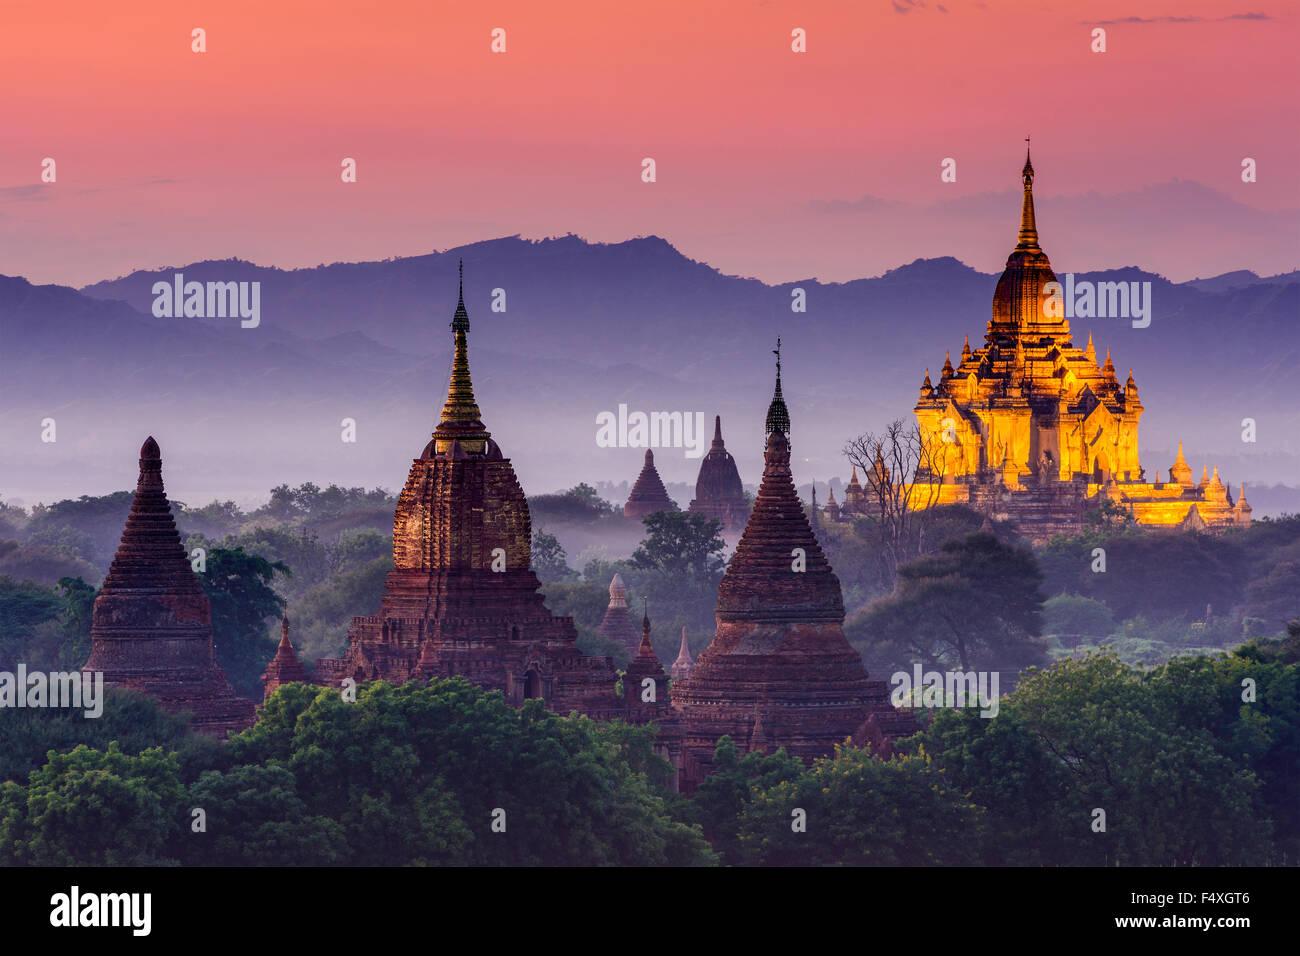 Bagan, Myanmar alte Tempel in der Abenddämmerung. Stockfoto